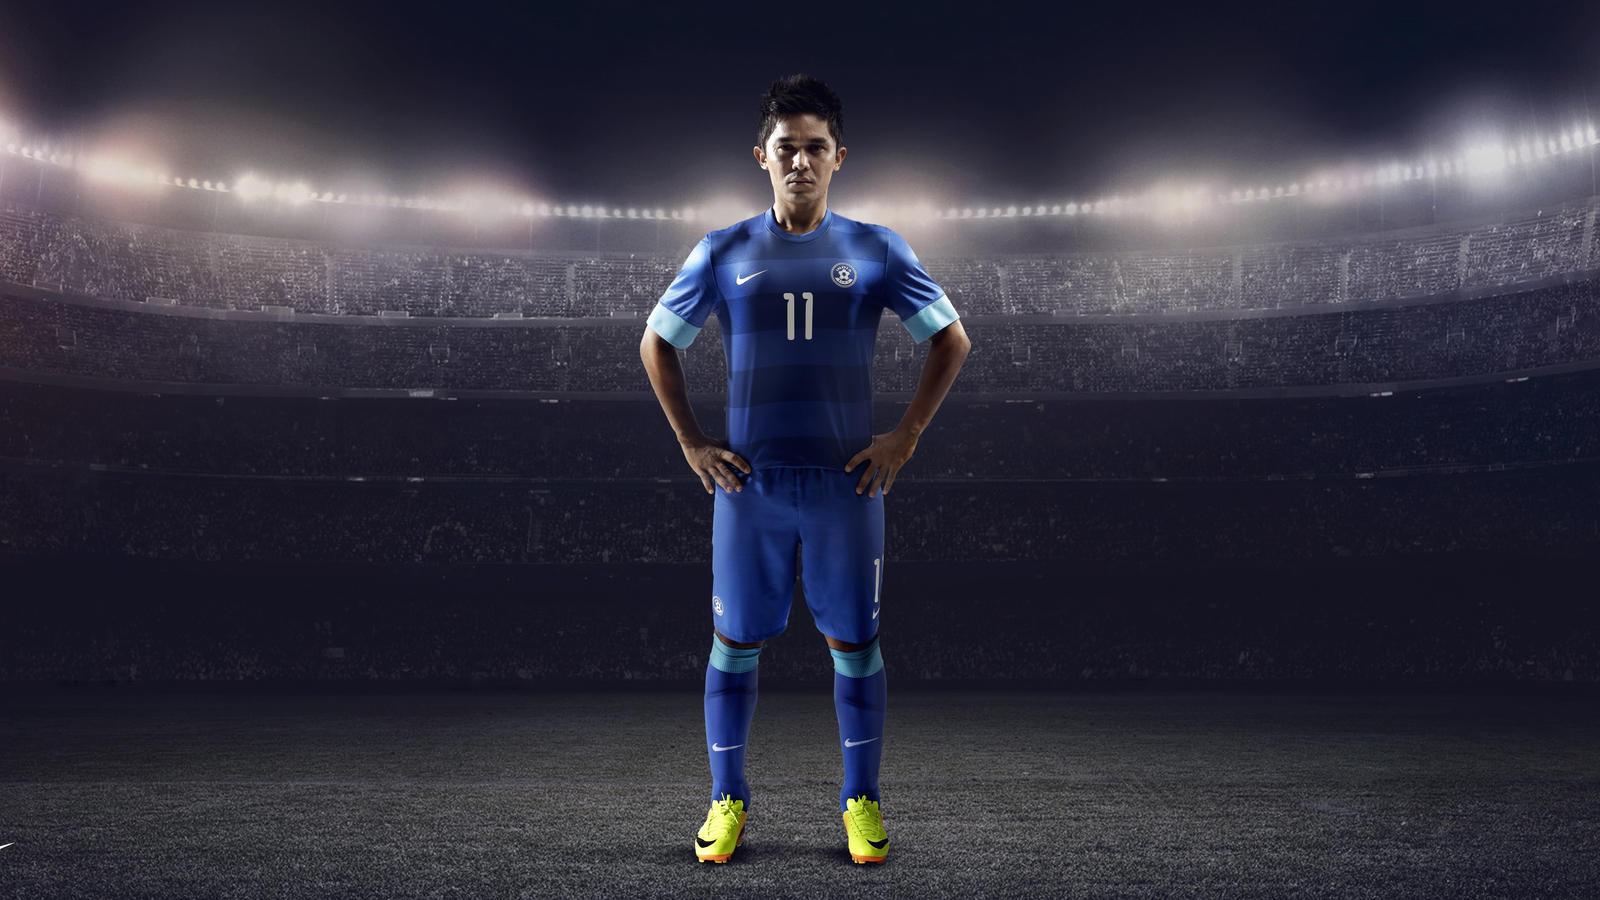 nike store soccer national team kits